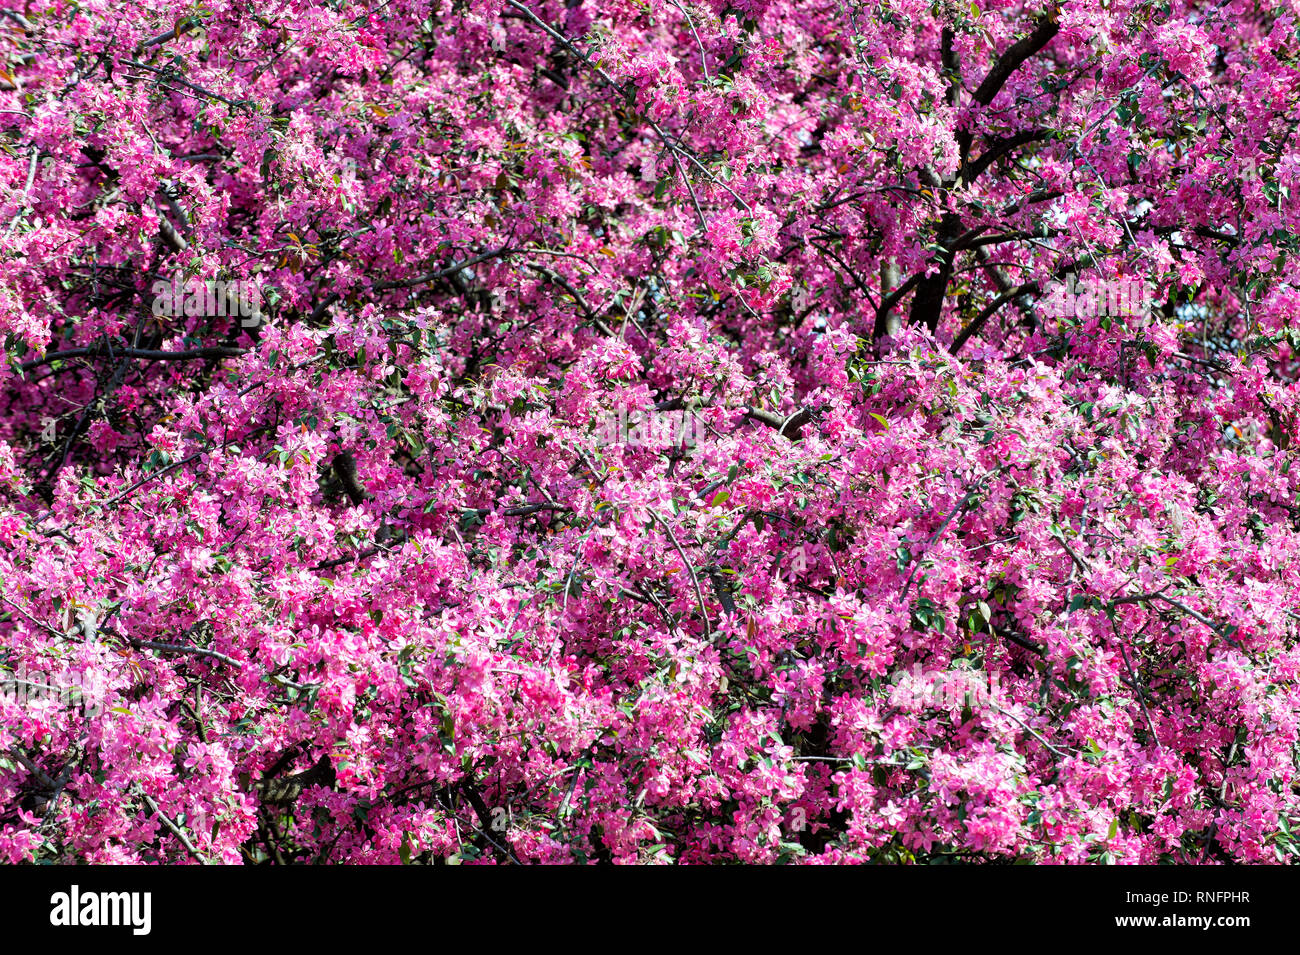 Sakura flowers blossoming in spring. Cherry tree in pink blossom on sunny day. Nature, beauty, environment. Sakura blooming season concept. Renewal, rebirth, new life awakening. - Stock Image